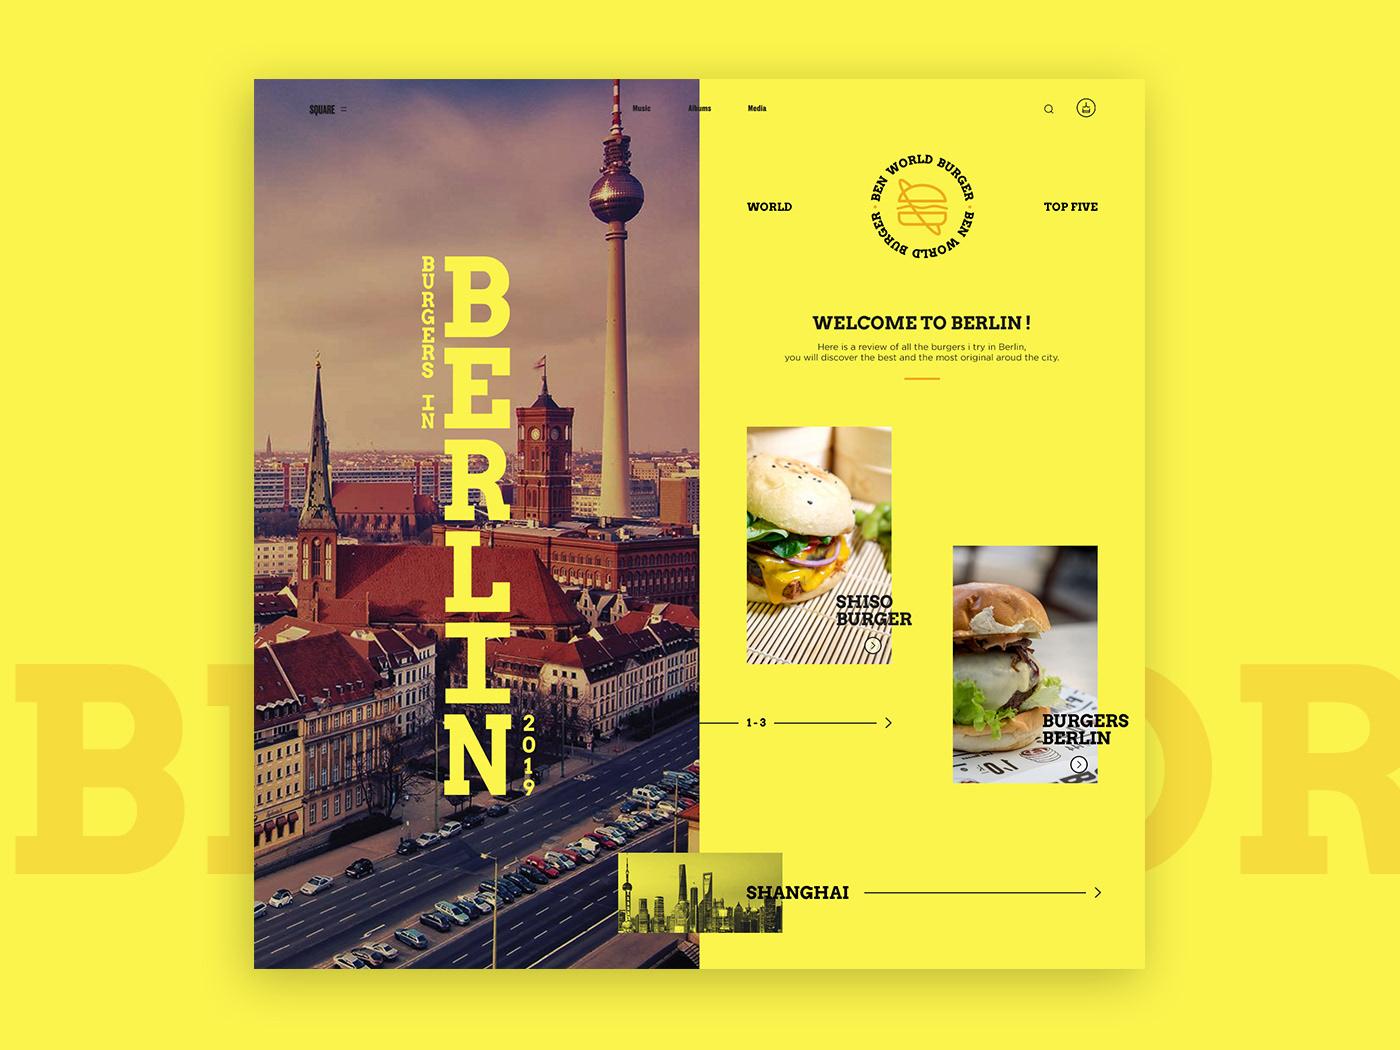 Fashion ,news,Competition,game,challenge,UI,ux,UI/UX,Web Design